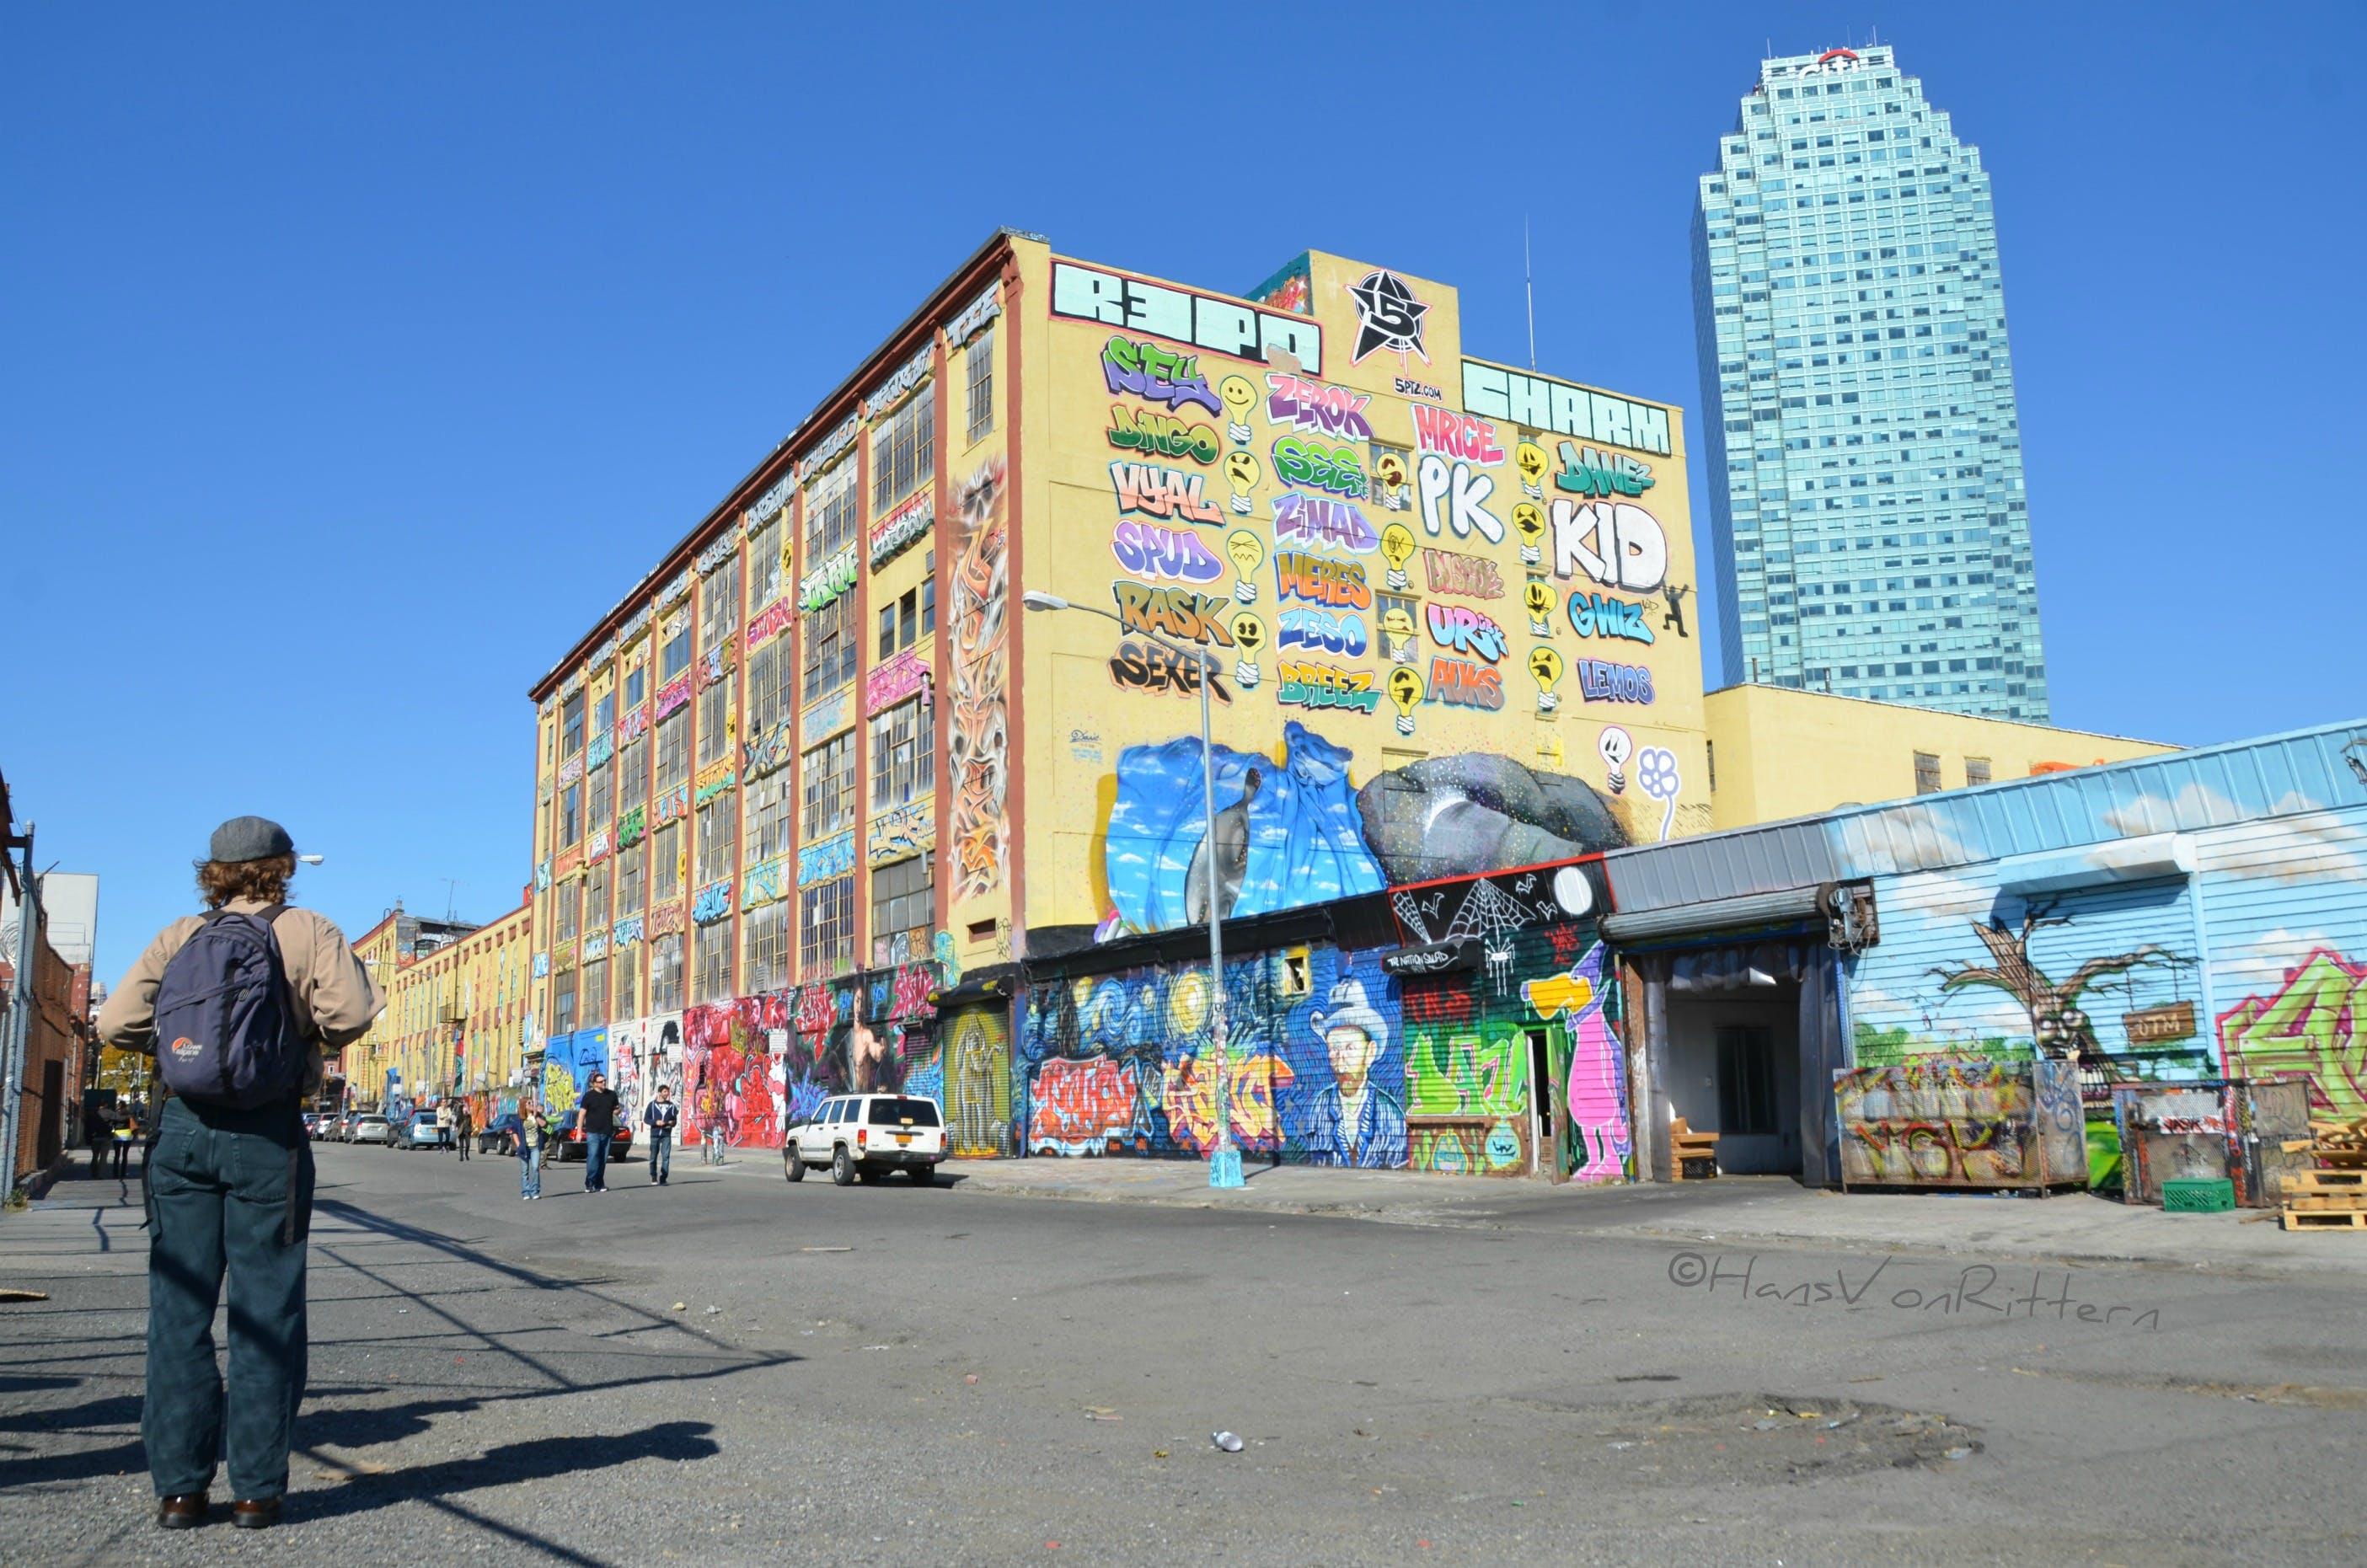 5 pointz long island city image hans von rittern via http